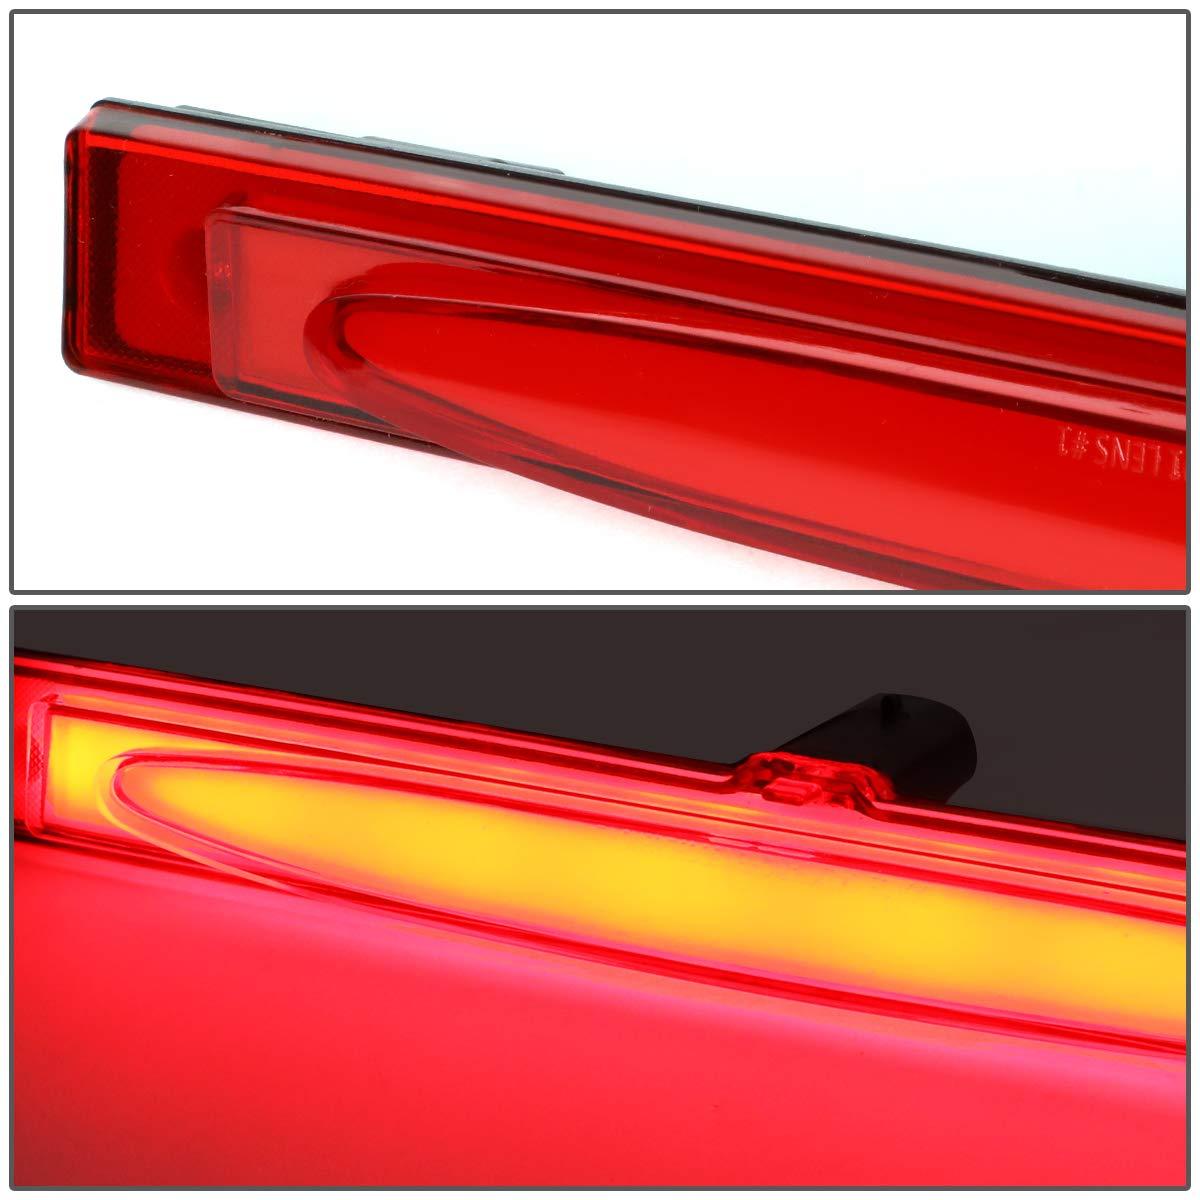 D/&D PowerDrive F22945 CASE IH Replacement Belt 43 Length Rubber A//4L Belt Cross Section